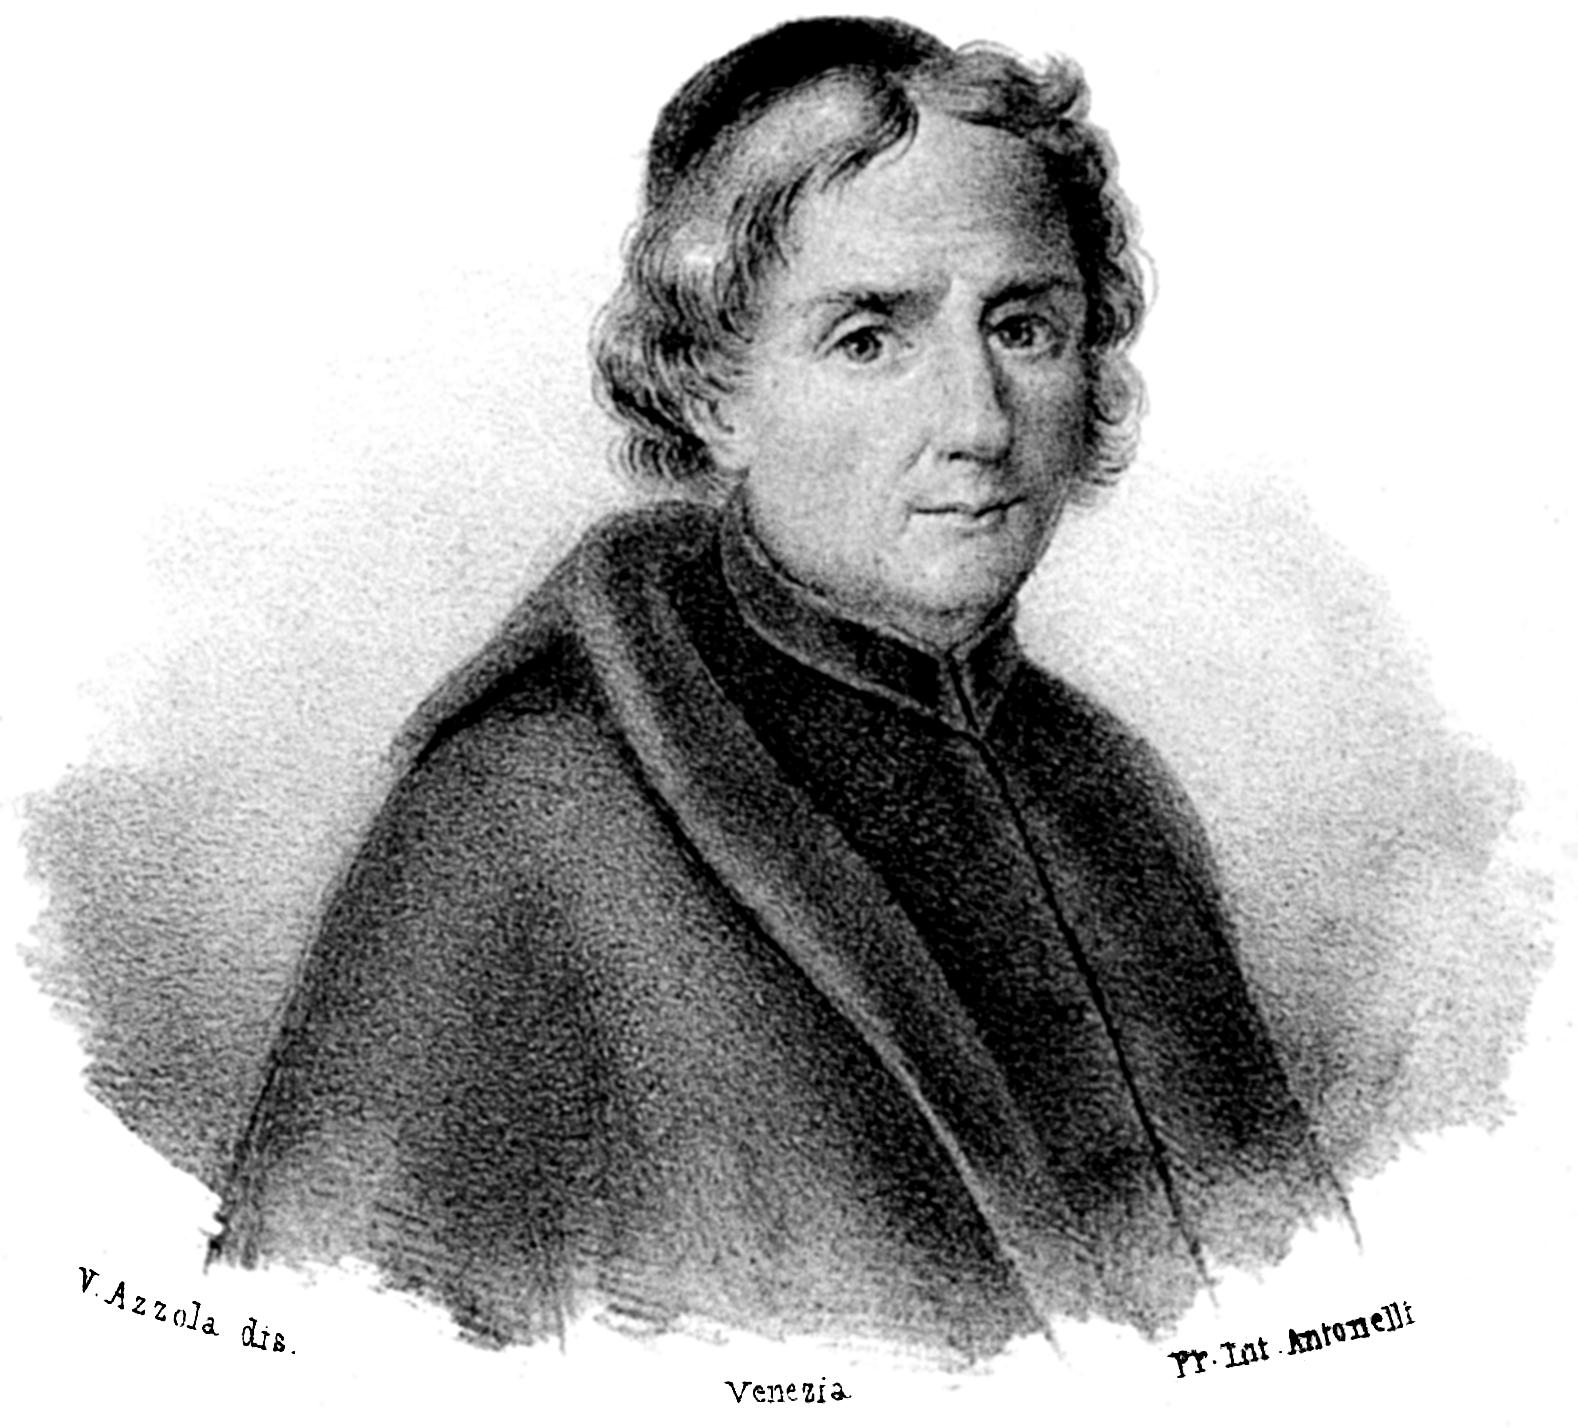 Ludovico_Antonio_Muratori.png (1578×1428)